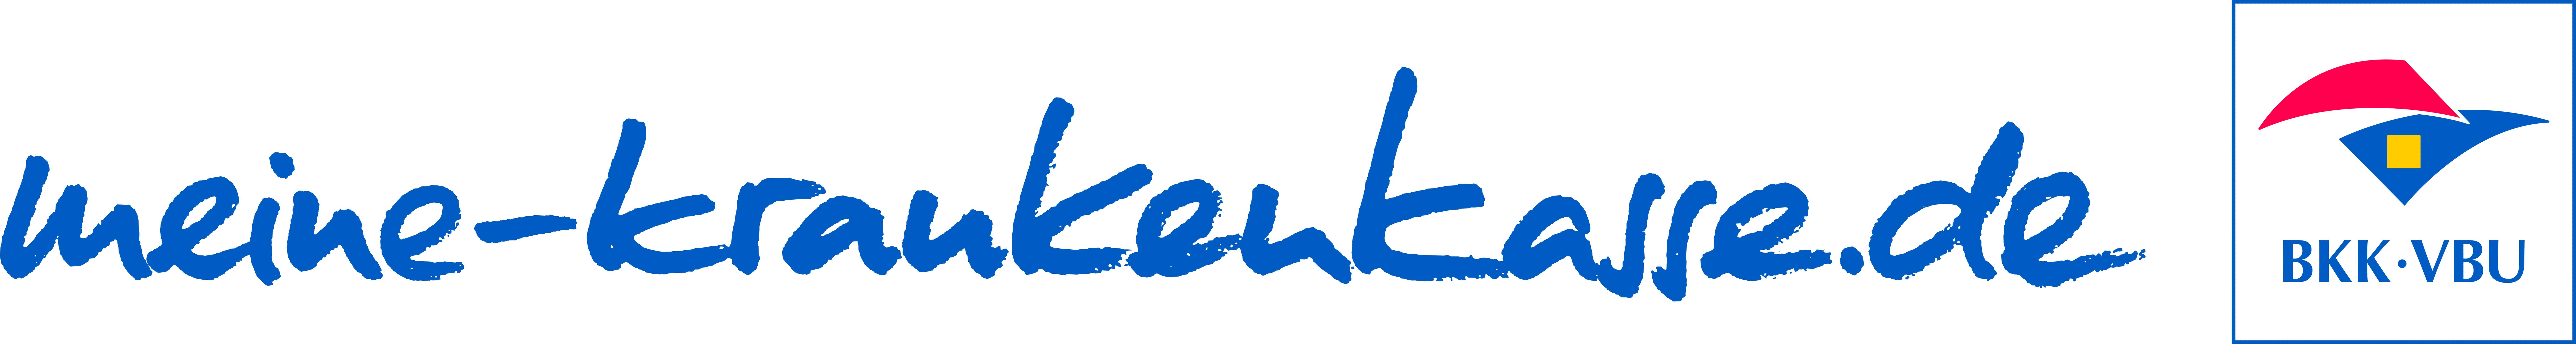 Online-Pflegekurse & Schulungen | BKK VBU